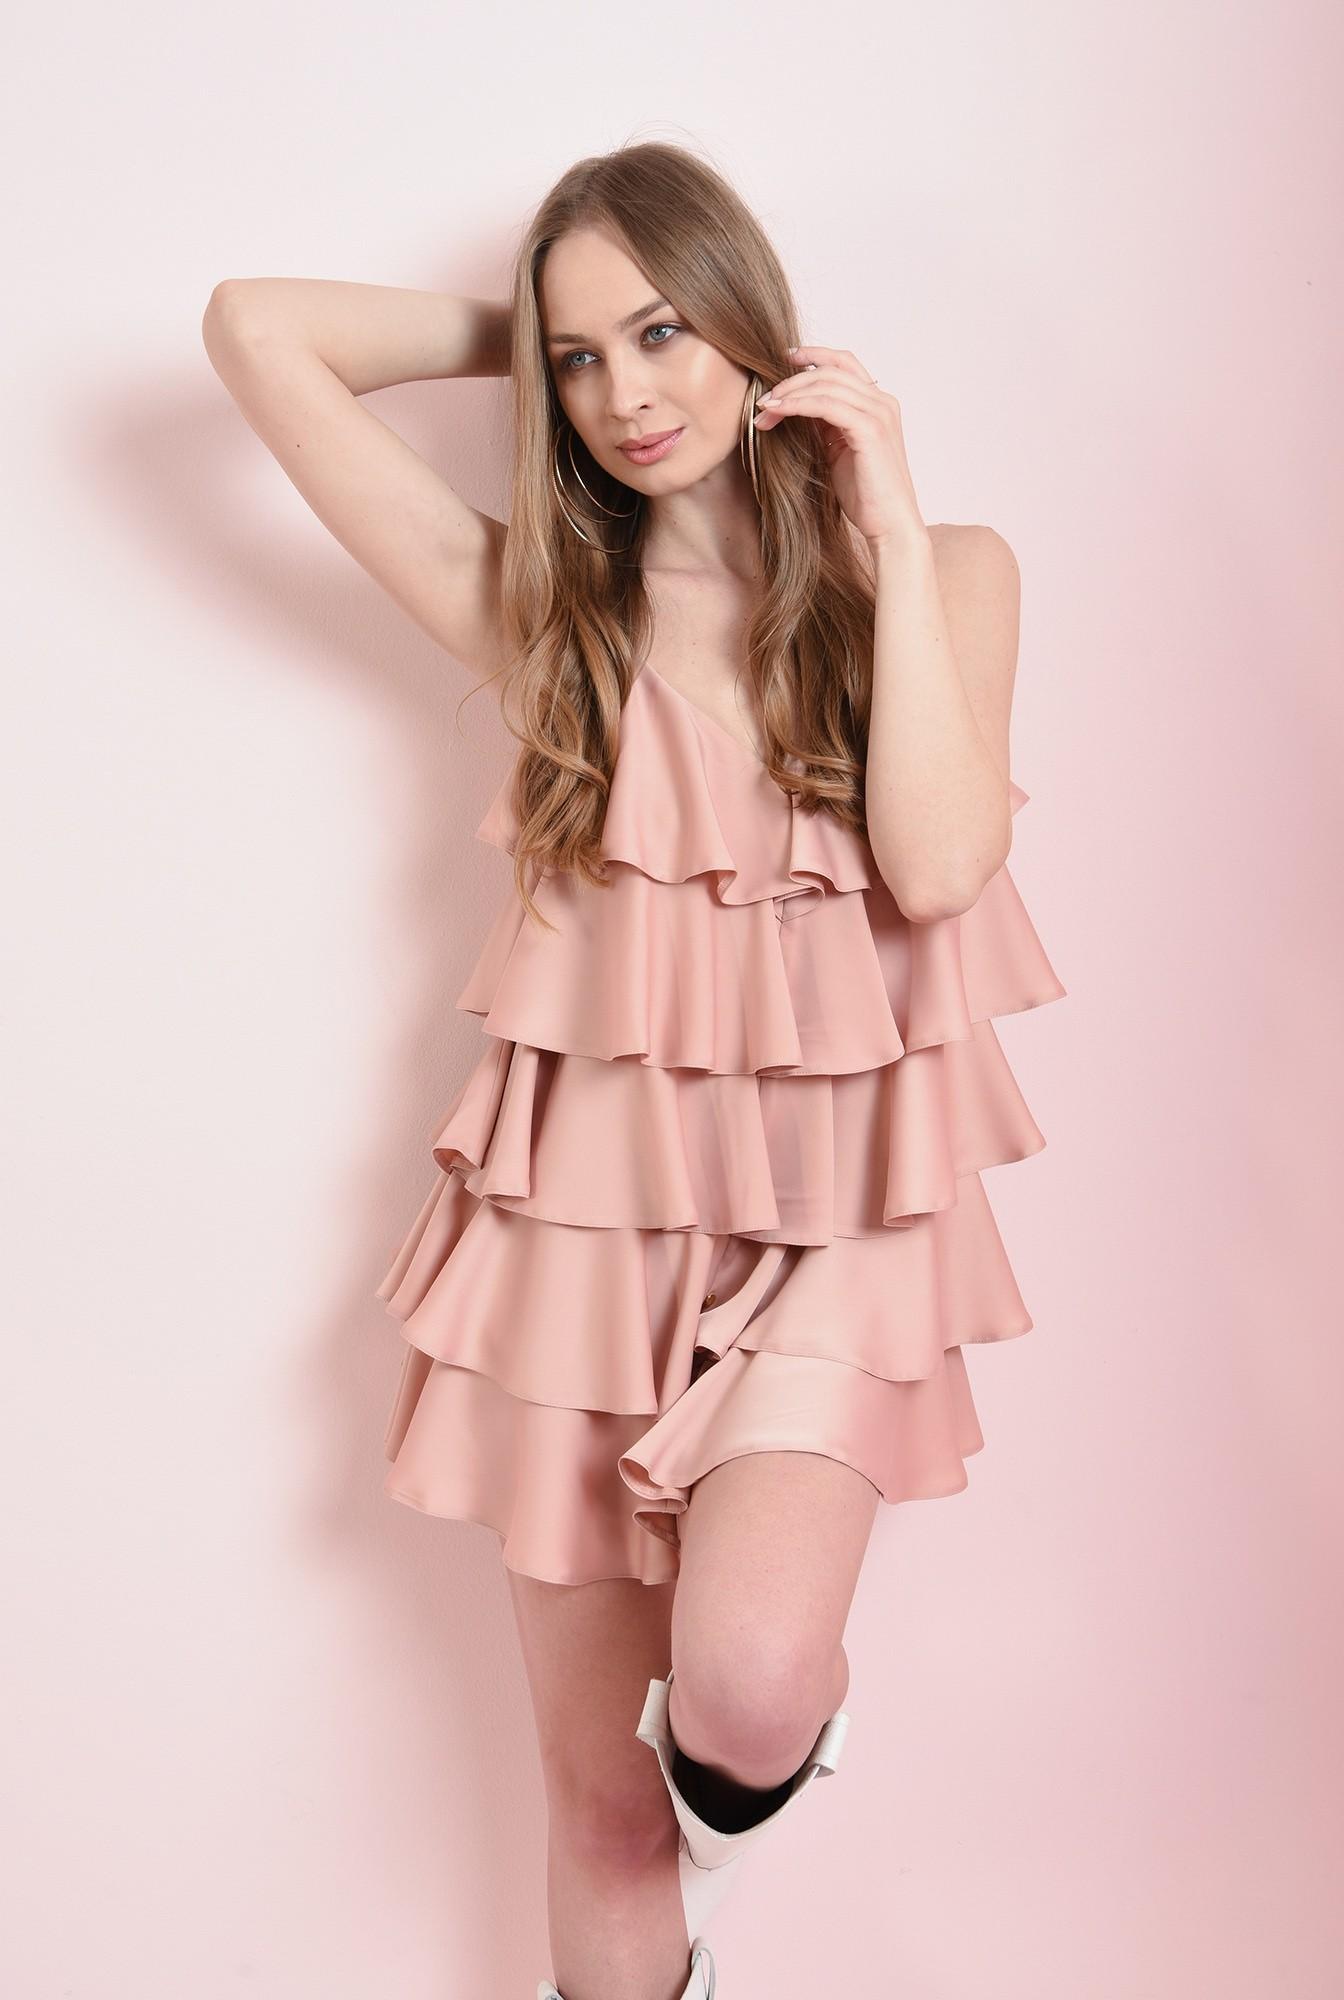 0 - rochie roz pastel, cu volane suprapuse